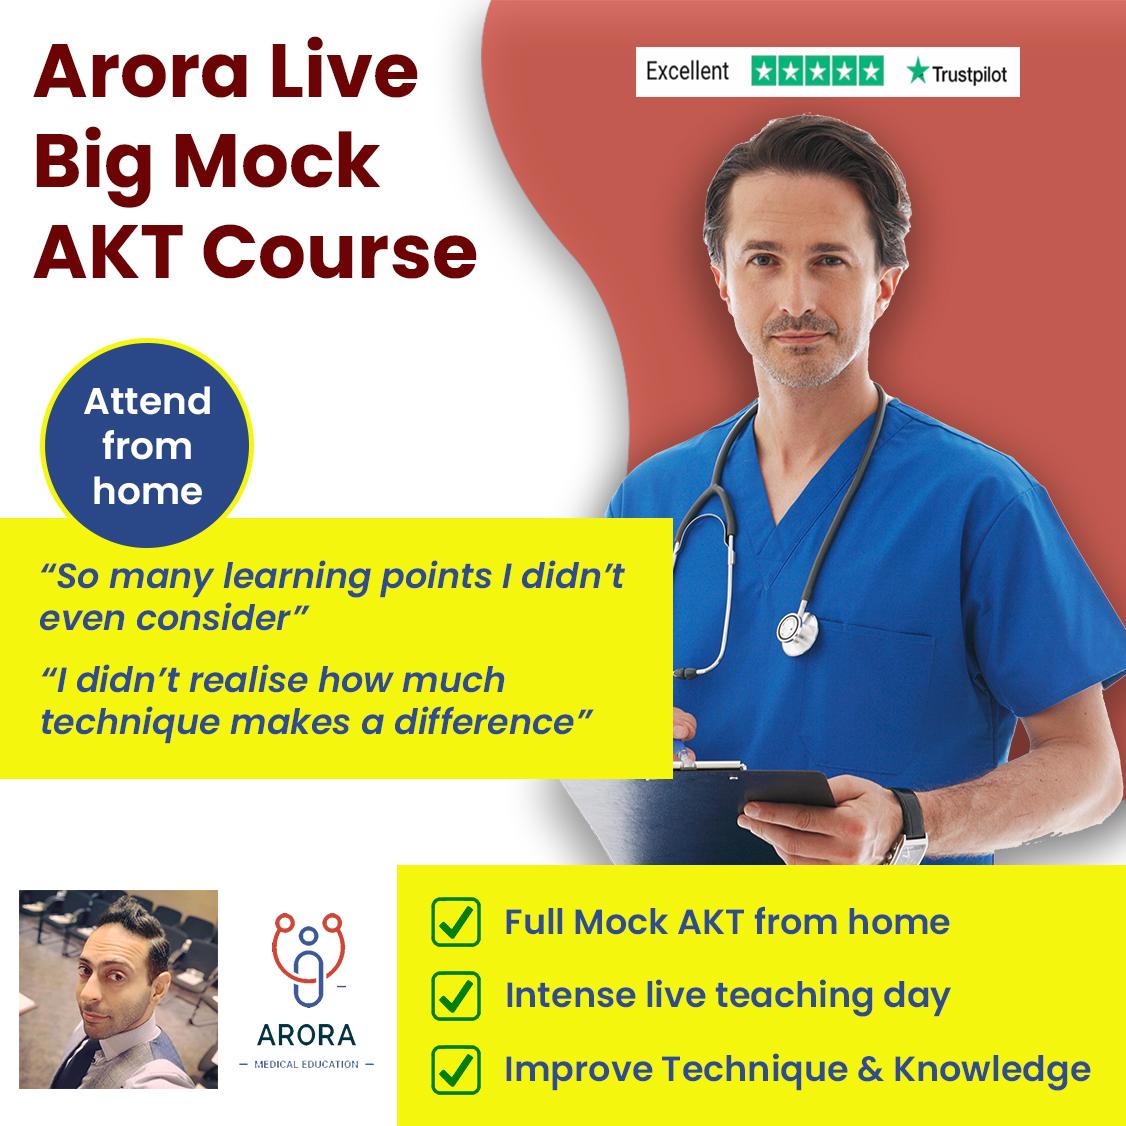 LIVE AKT 1 - MRCGP CSA, AKT and PLAB Exam Courses and Online Webinars - Arora Medical Education